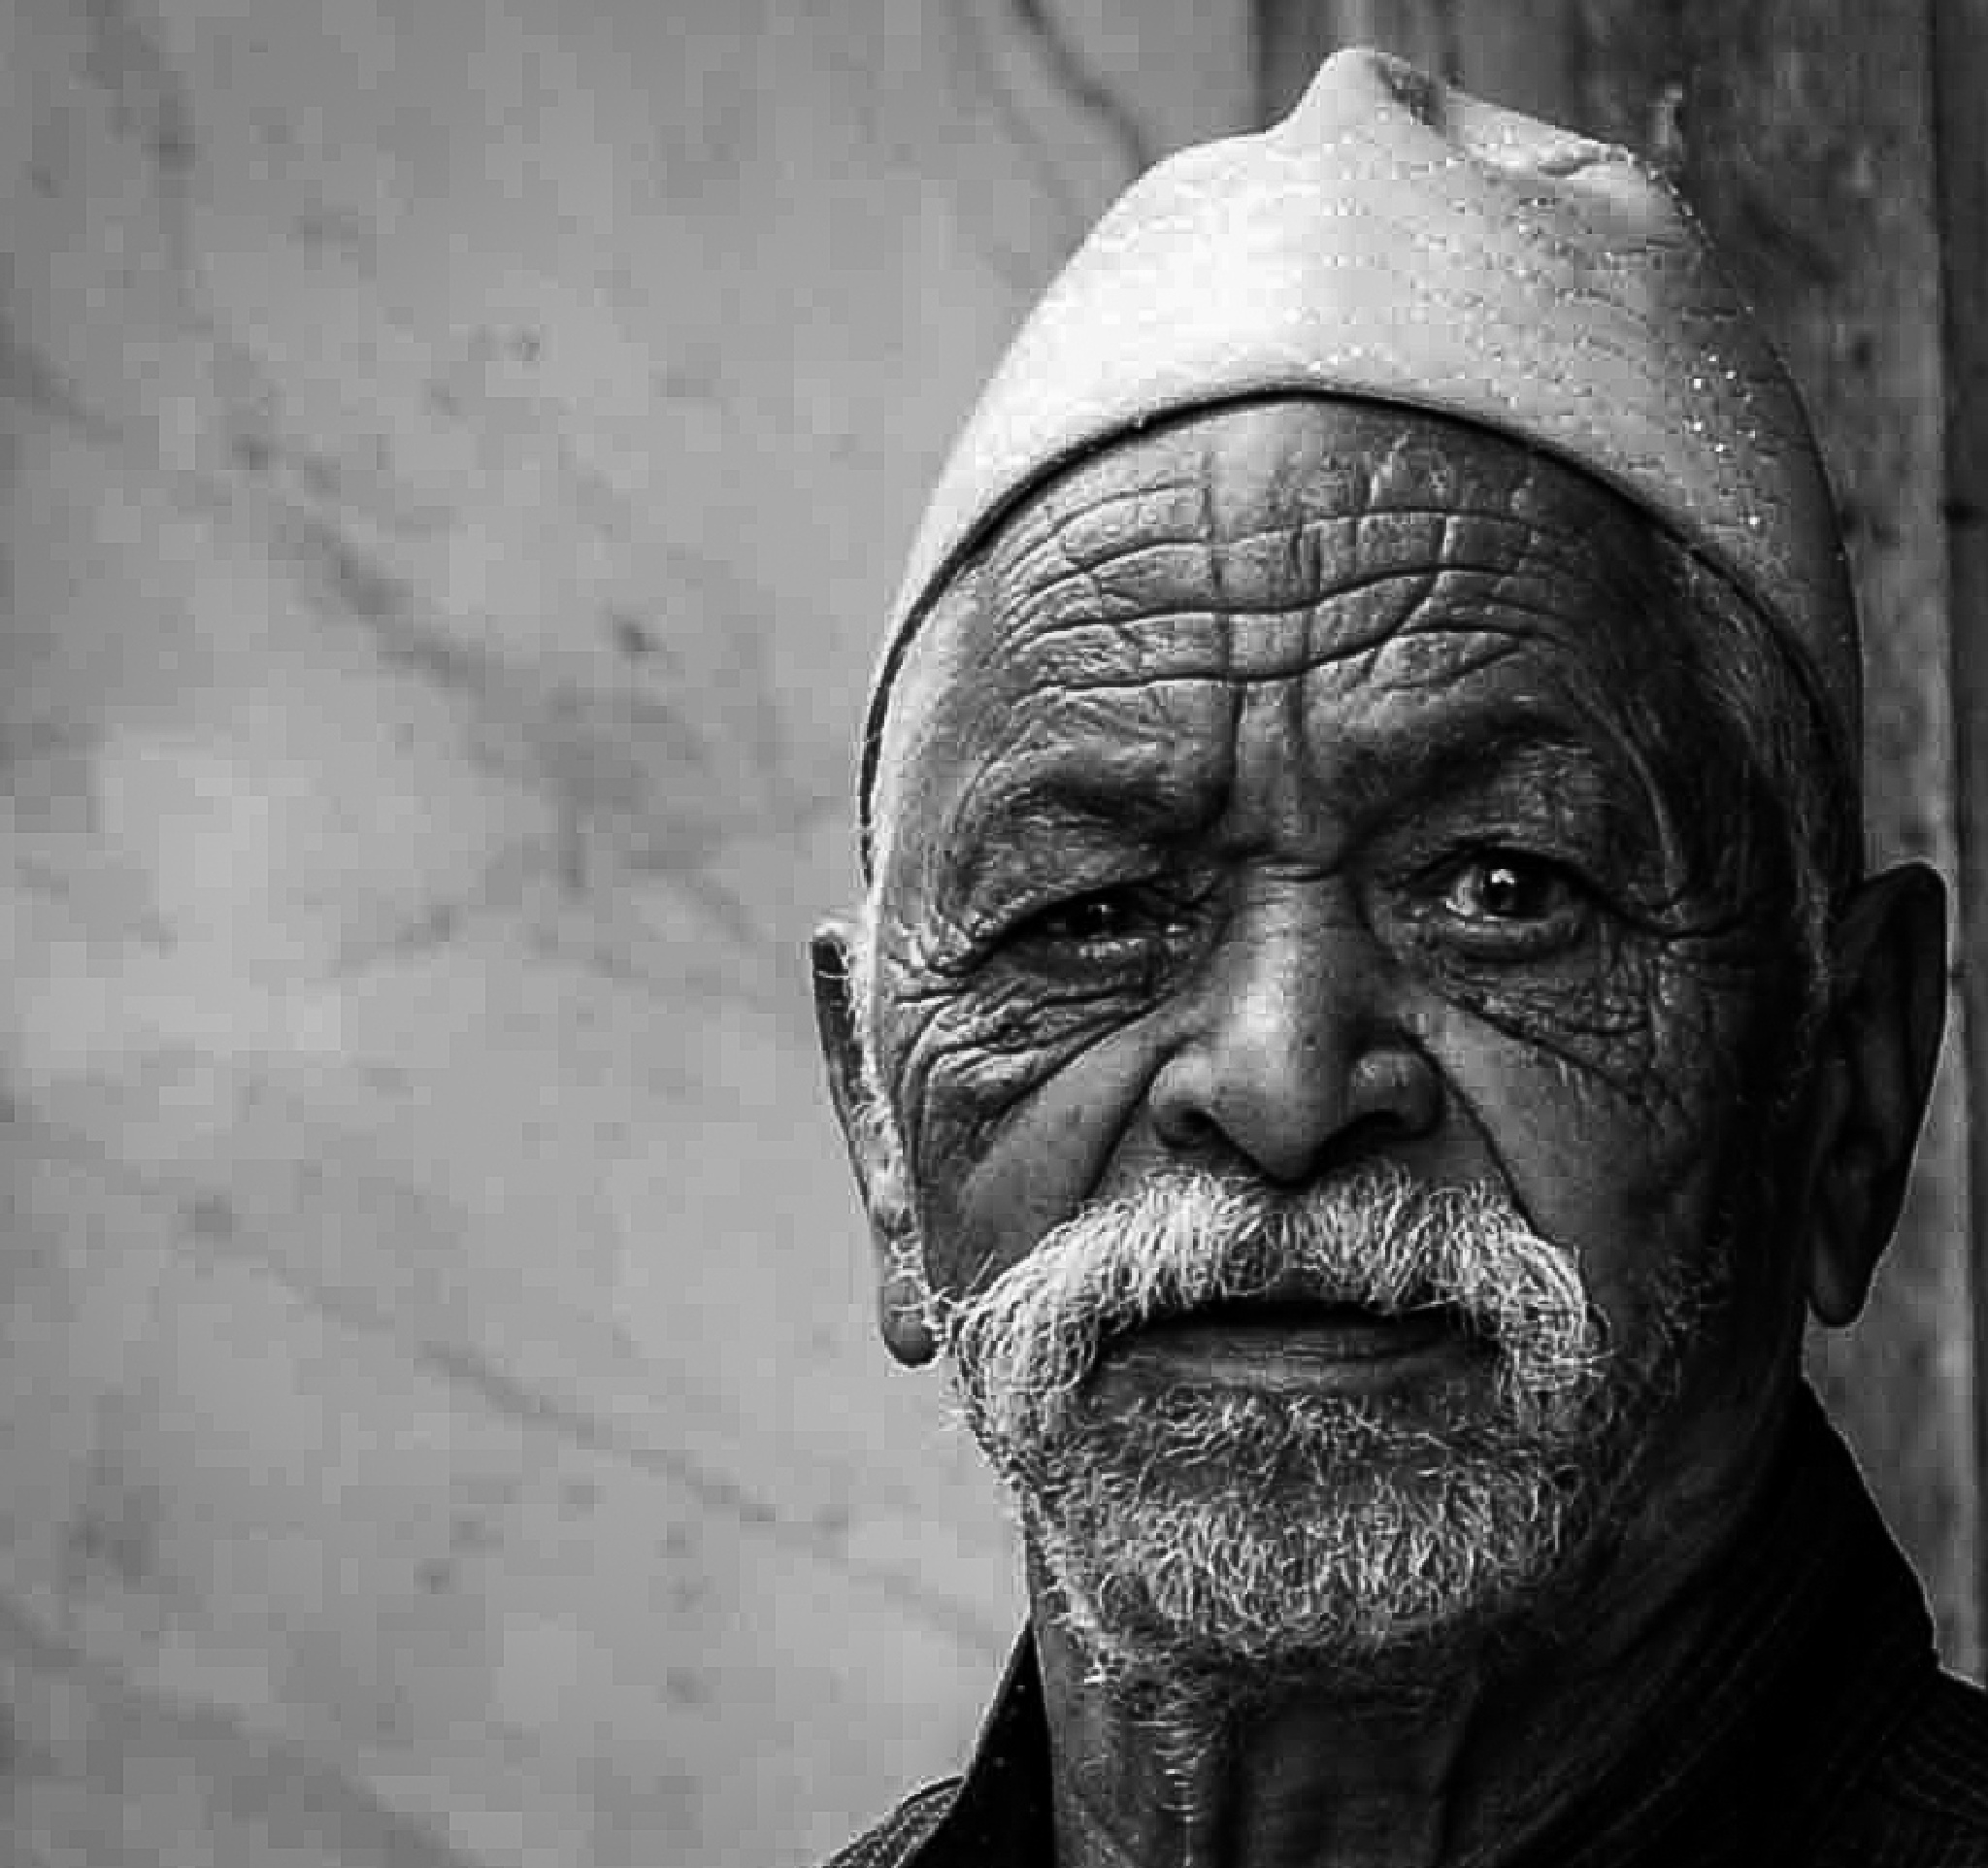 Old Man 1 by Serge Kay